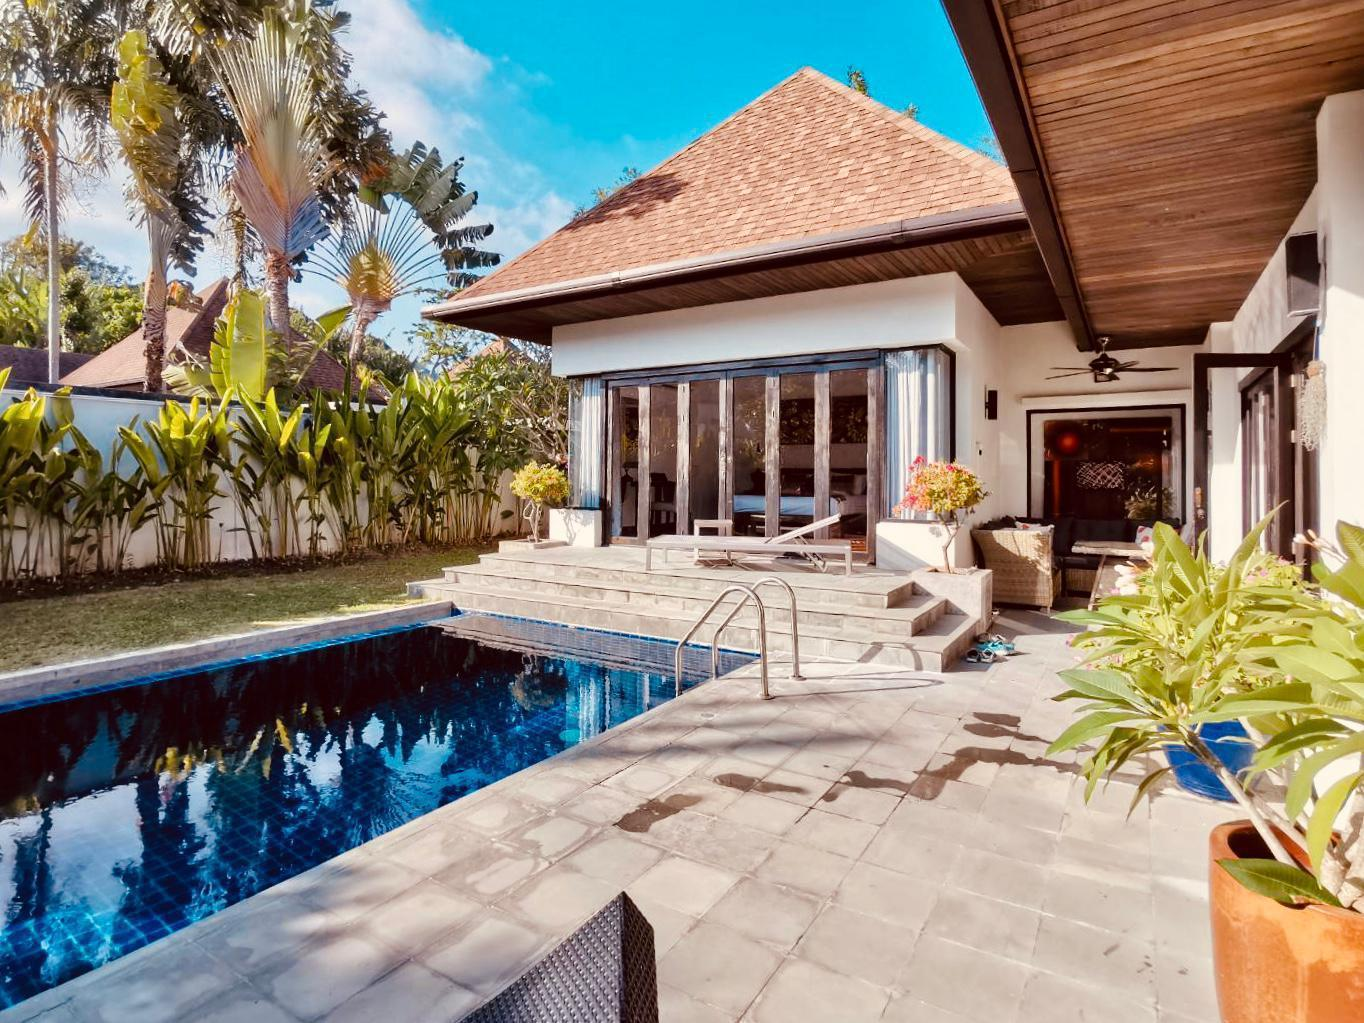 2 BDR Greenery Pool Villa Rawai-Naiharn วิลลา 2 ห้องนอน 2 ห้องน้ำส่วนตัว ขนาด 460 ตร.ม. – ในหาน